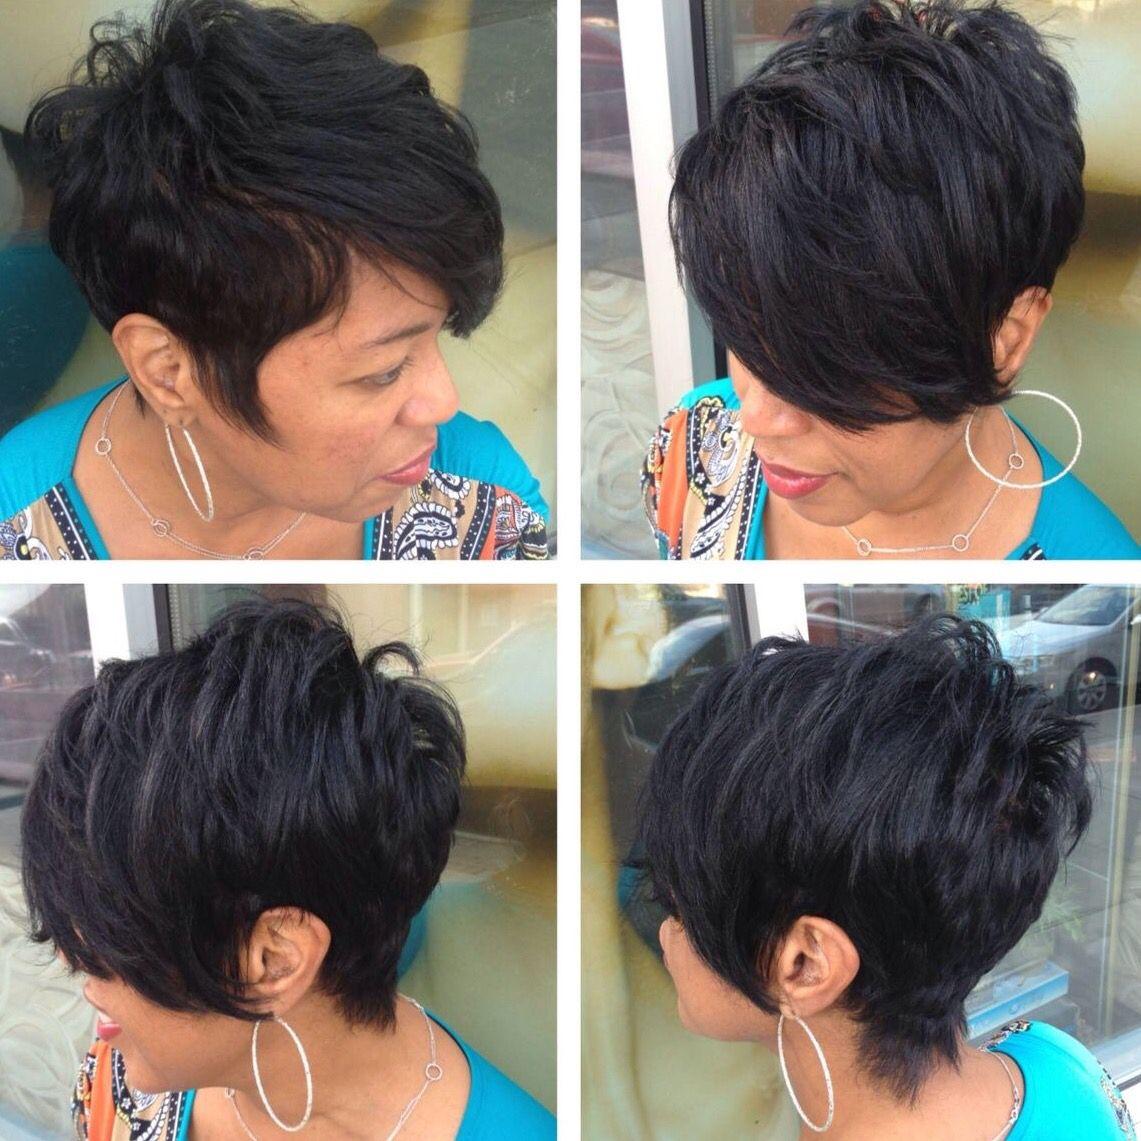 i like | fly short hairstyles | pinterest | short hair, shorts and